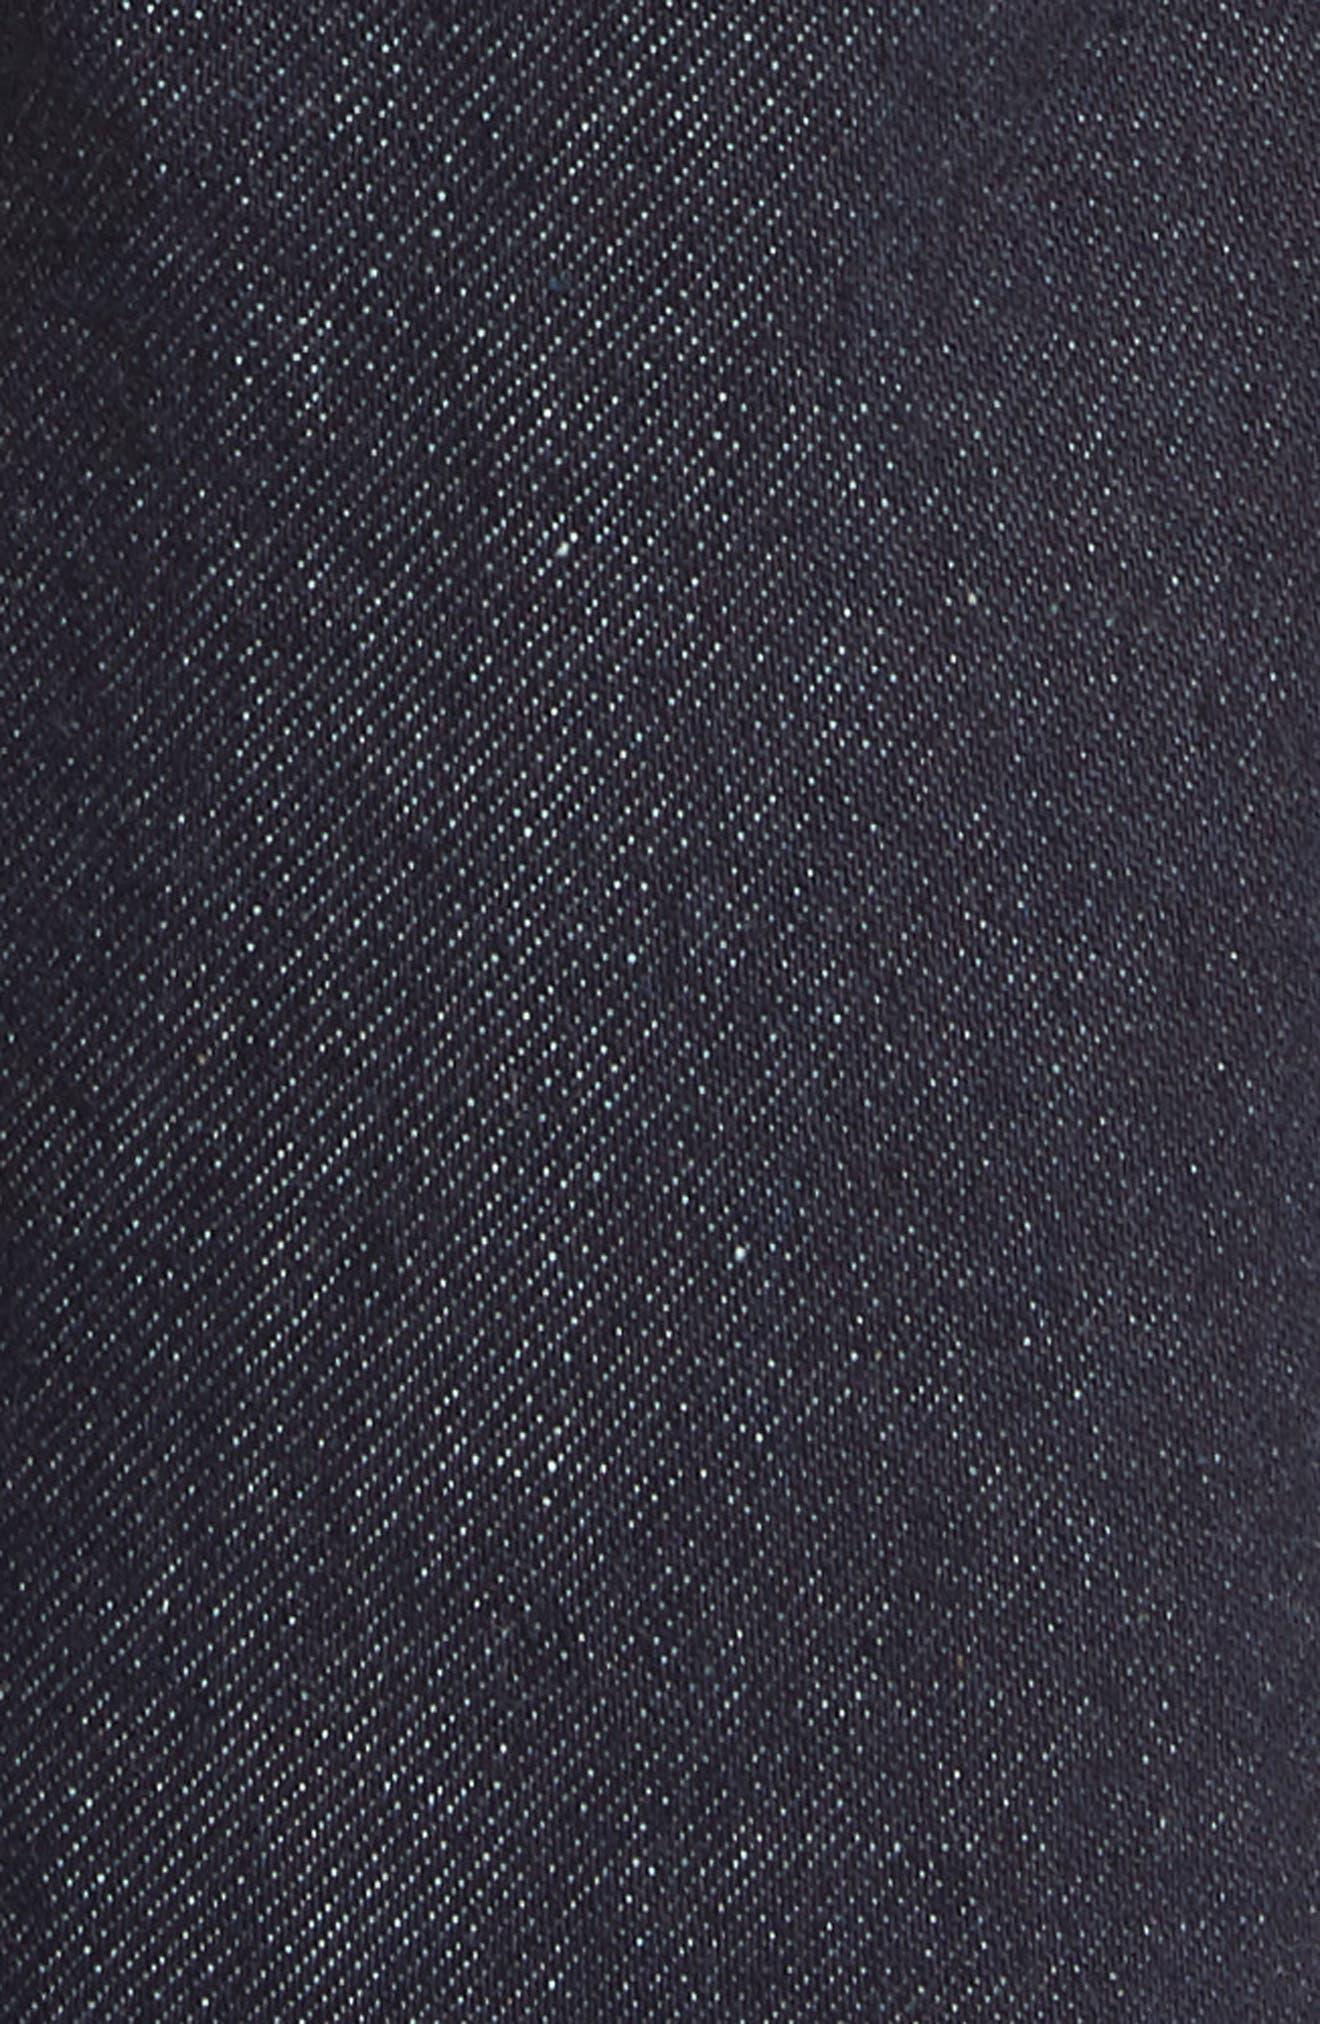 Fit 1 Skinny Fit Jeans,                             Alternate thumbnail 5, color,                             INDIGO RINSE SELVEDGE